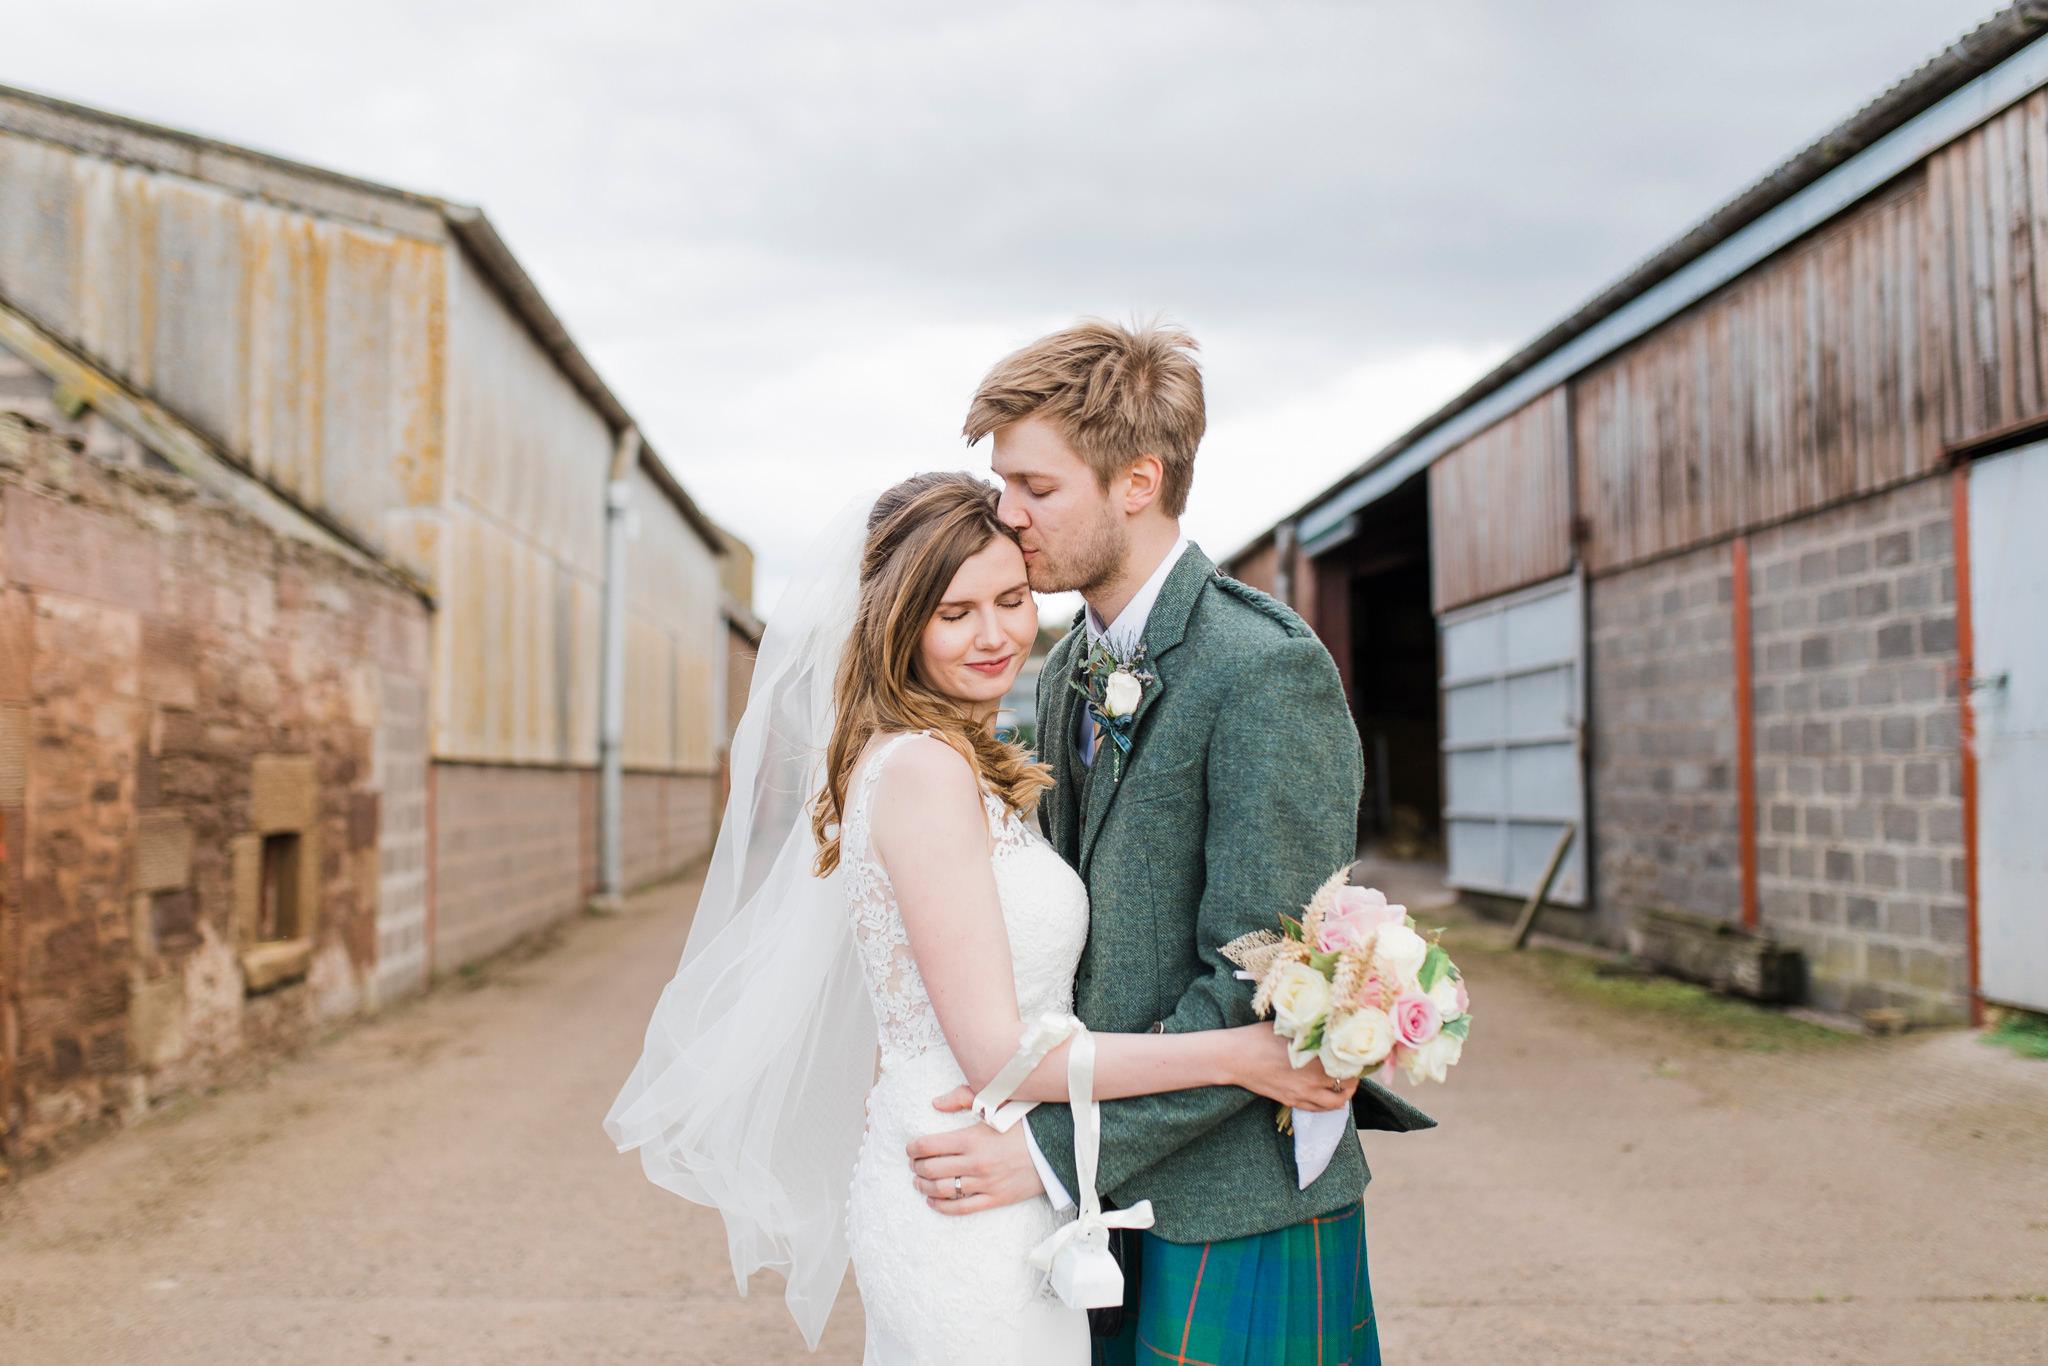 082-destination-wedding-photography.jpg